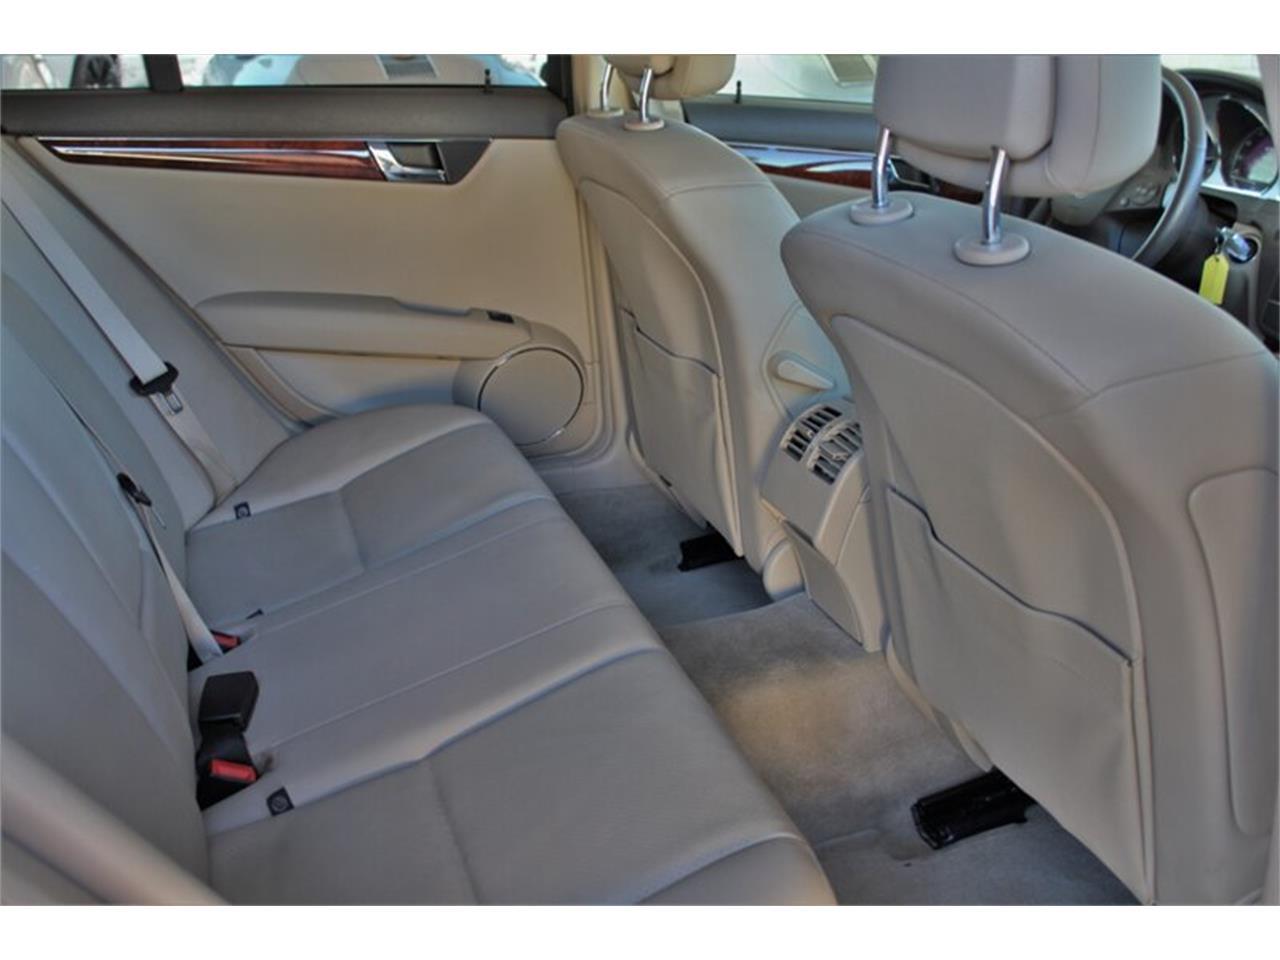 2011 Mercedes-Benz C-Class (CC-1297843) for sale in Sherman Oaks, California